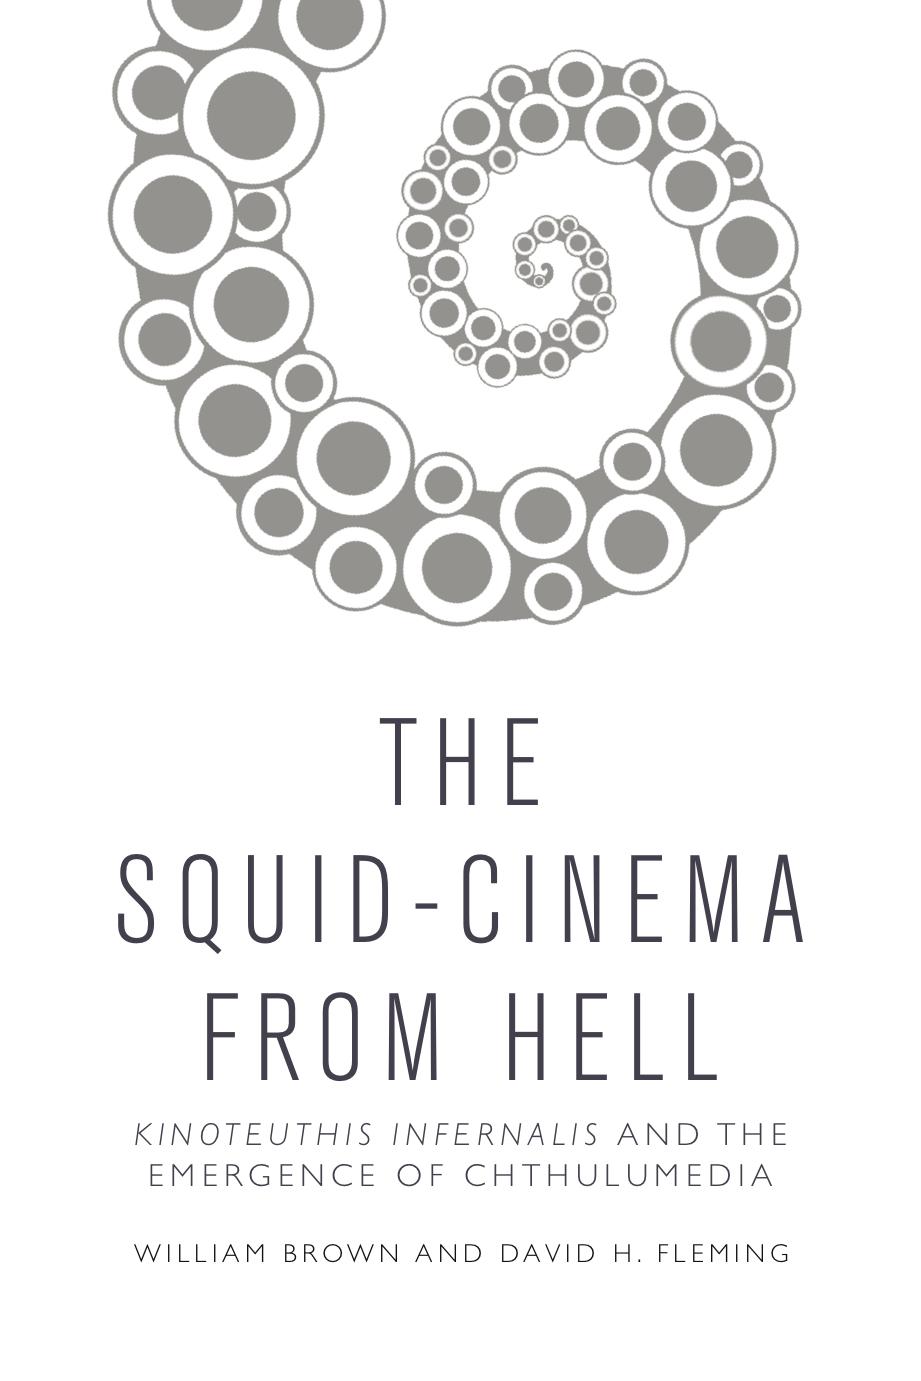 squid-cinema-cover-4.jpg